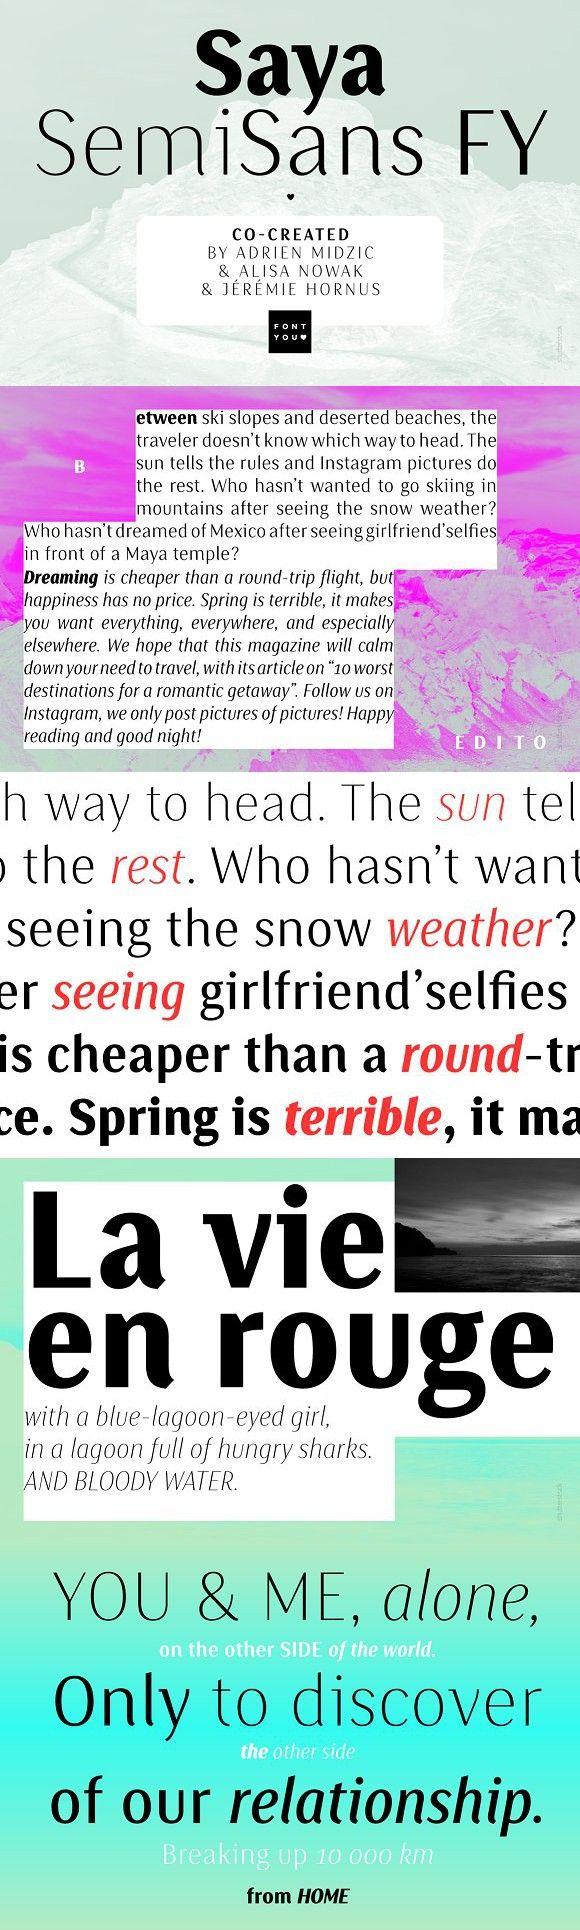 Saya SemiSans FY Thin Italic. Sans Serif Fonts. $50.00